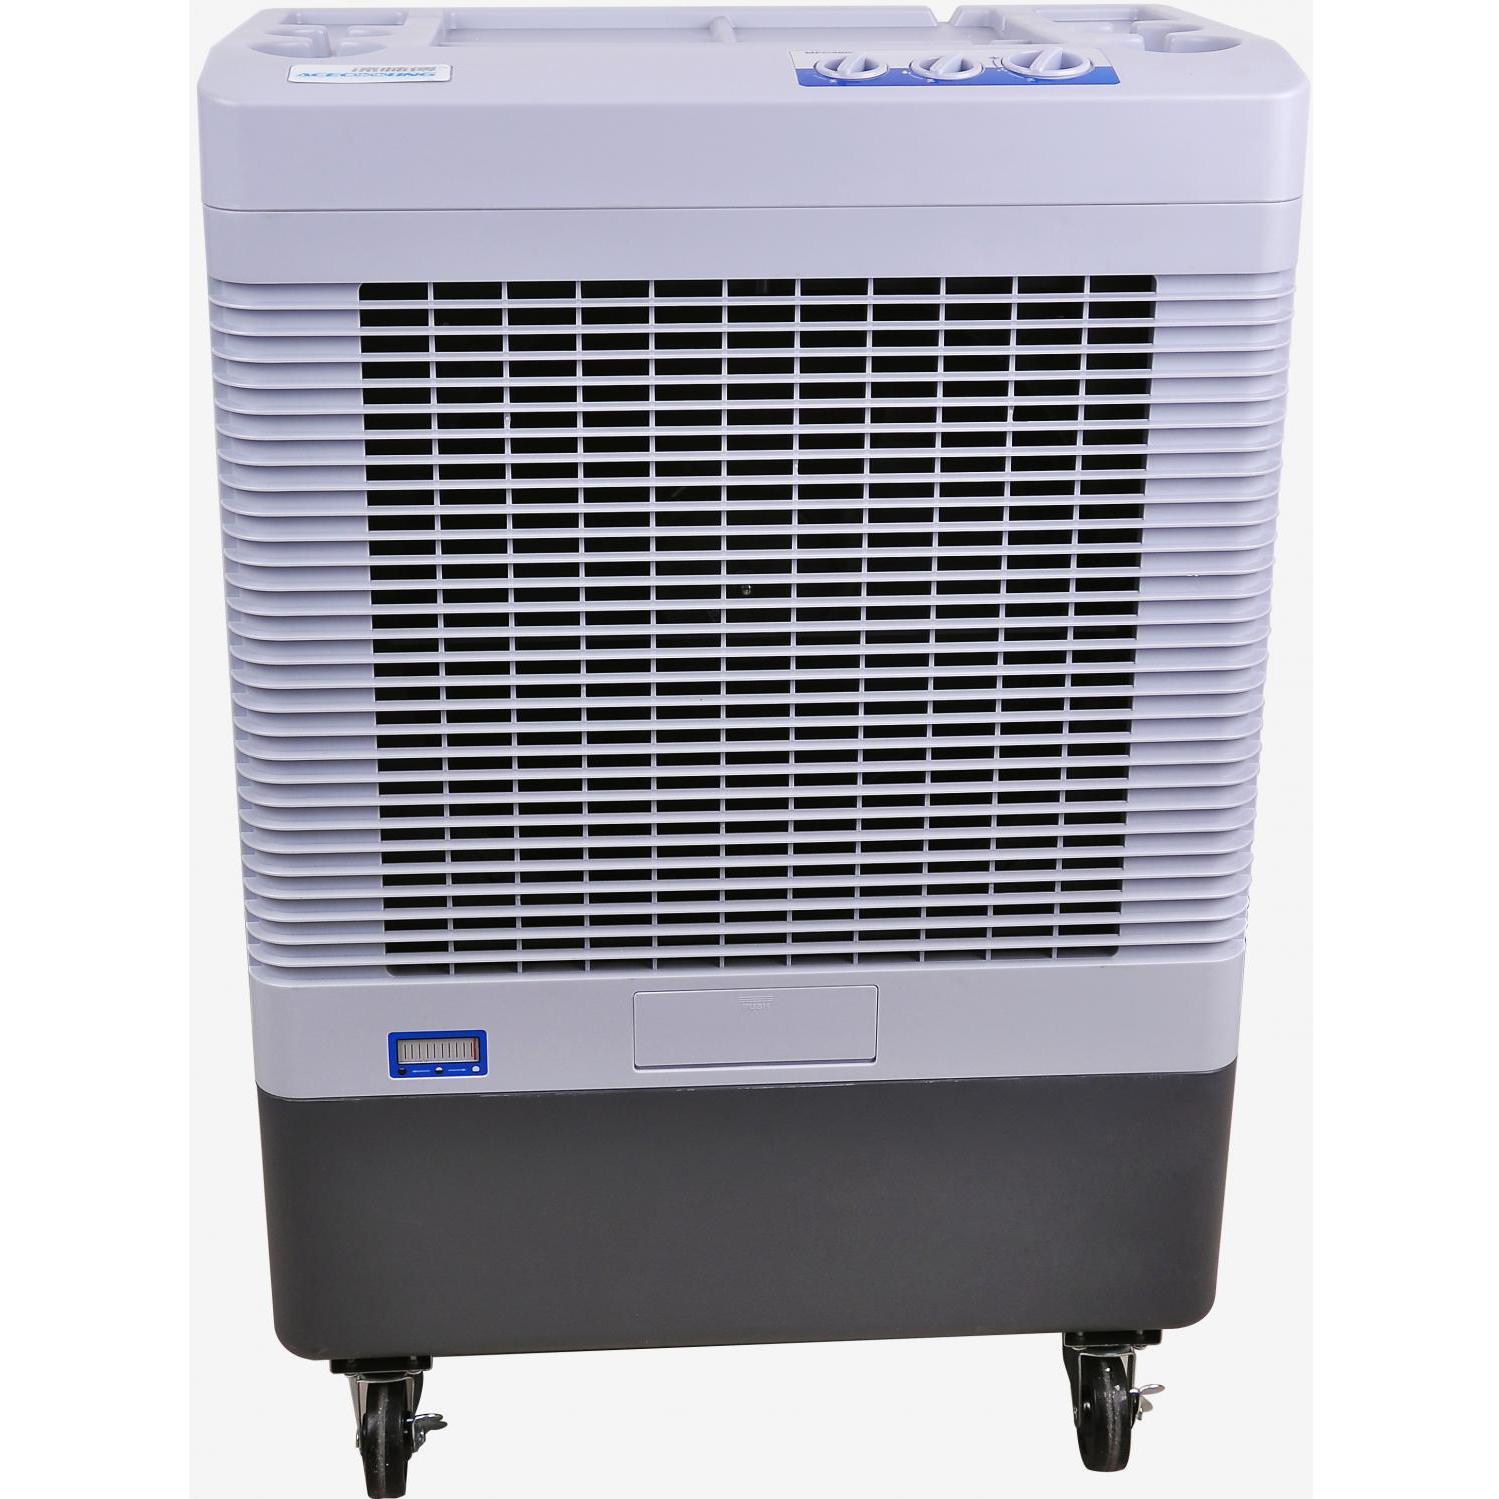 Hessaire 750 Sq. Ft. Portable Evaporative Air Cooler 2892860